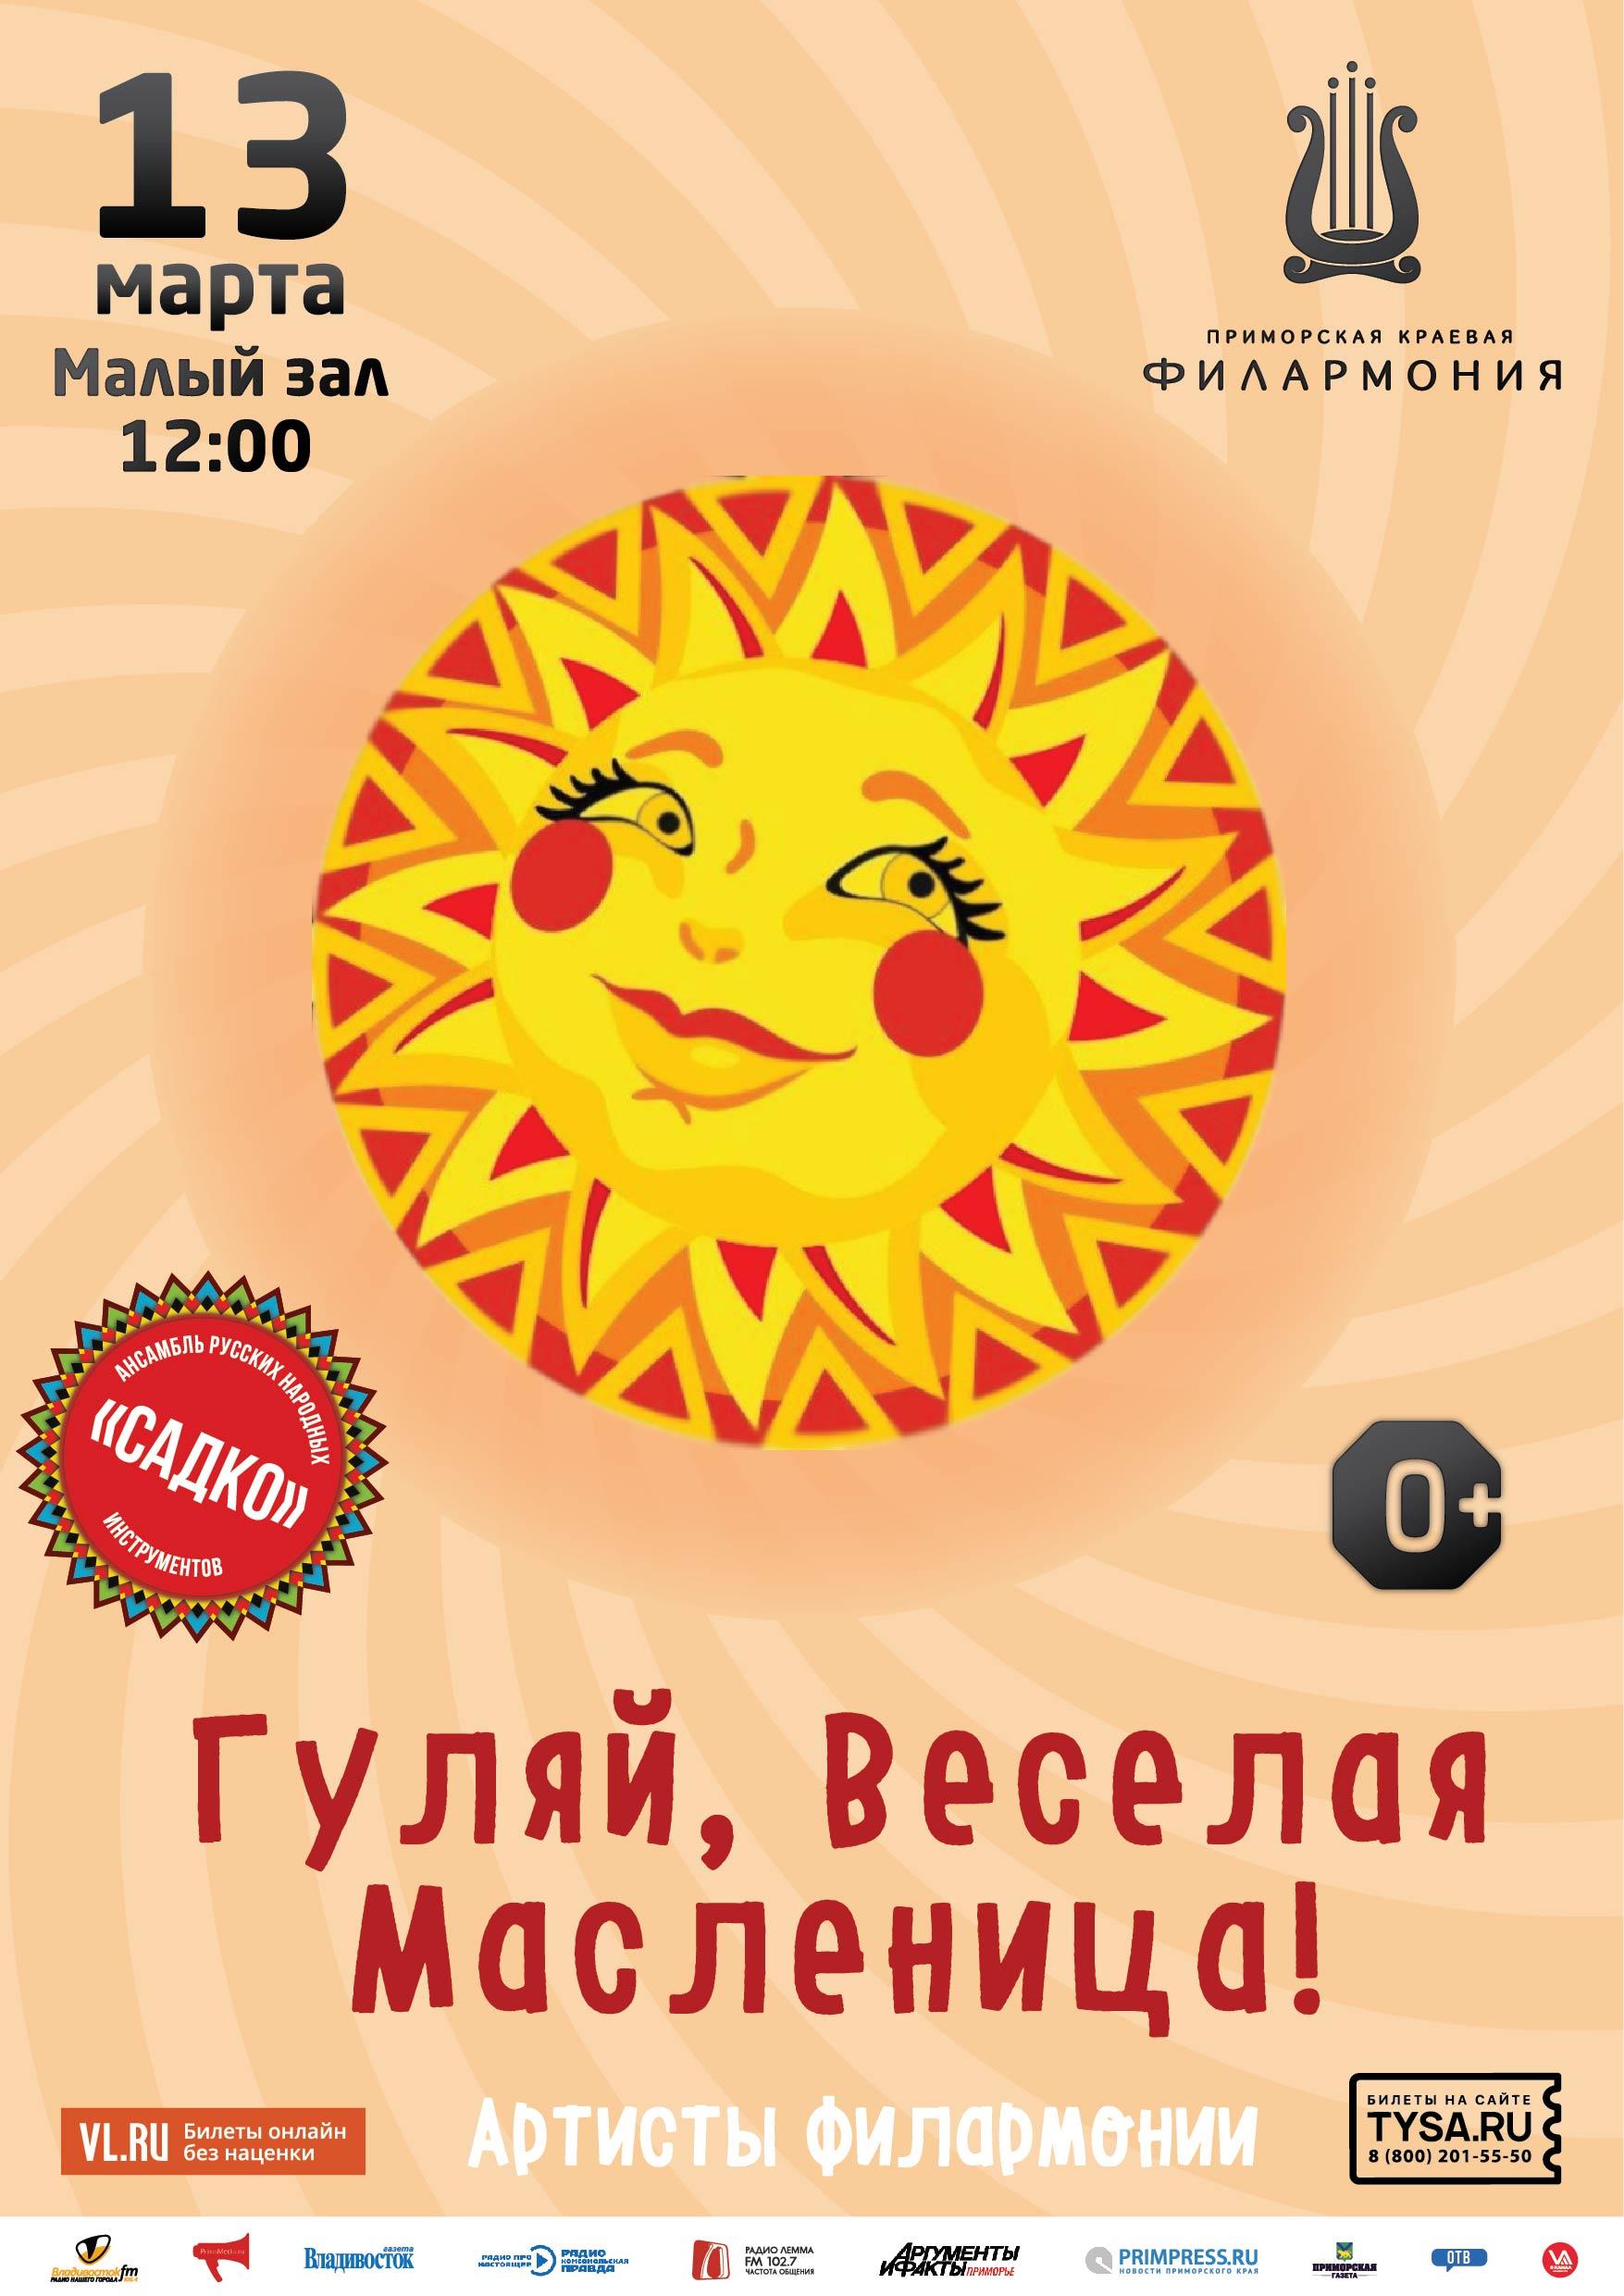 13 марта Детская музыкальная программа «Гуляй, Веселая Масленица!»